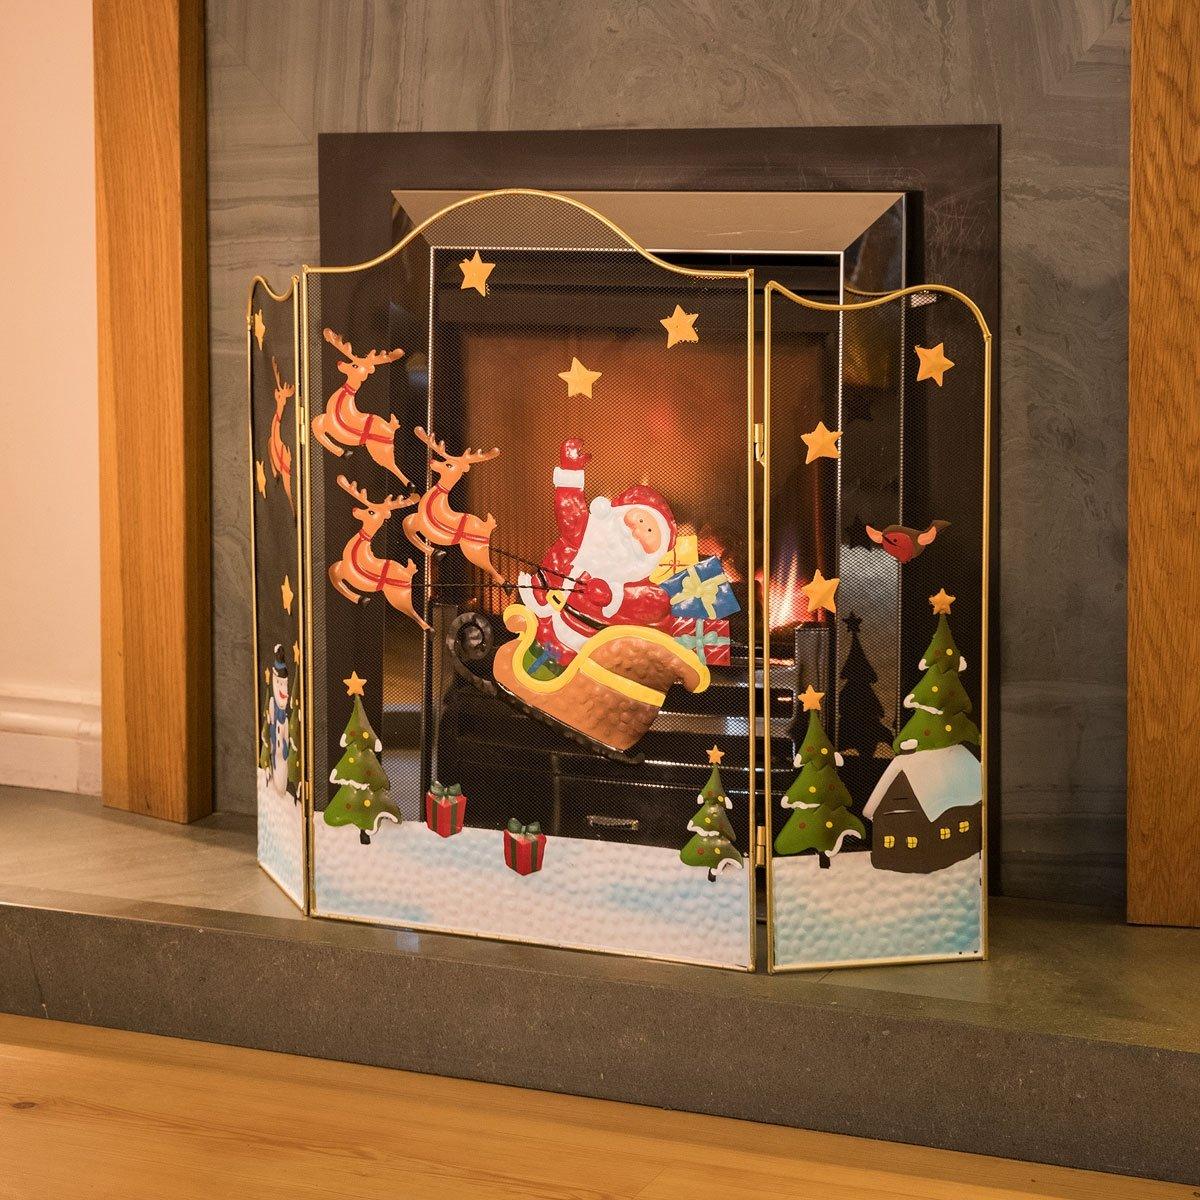 3 Panel Fireguard Fireplace Screen Santa Sleigh Christmas 61cm x 80cm Christow